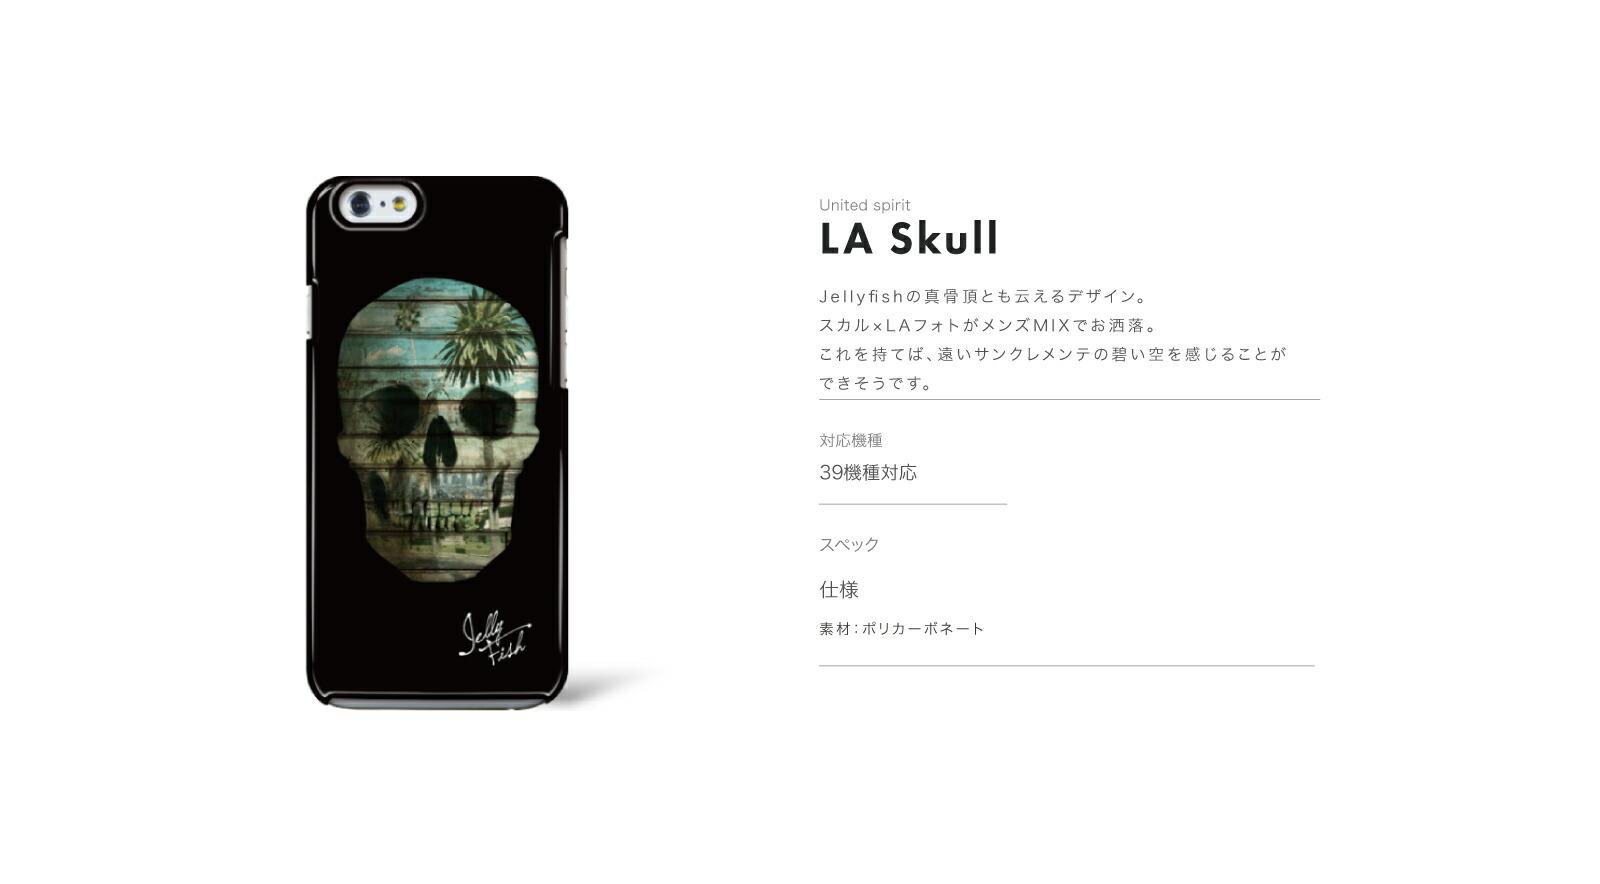 5df89fcbc1 送料無料 docomo au アイフォン6 スマホカバー iPhone6 iPhone6Plus iPhone5s iPhone5 LASkull ( ハードケース) スマホケース スマホ カバー ...